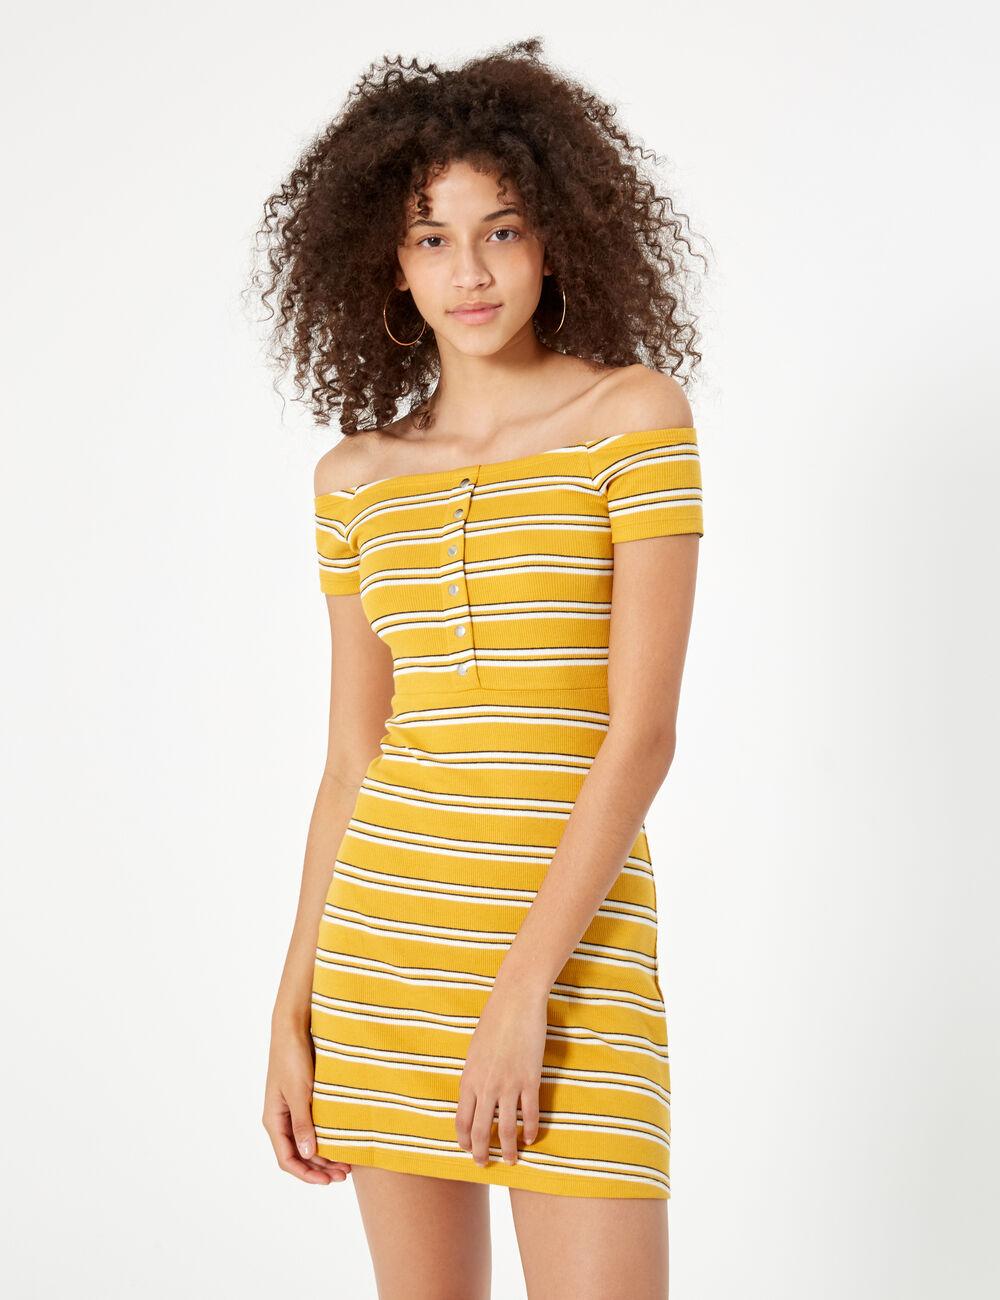 4180e6c37cb60 Yellow, black and white striped dress woman • Jennyfer